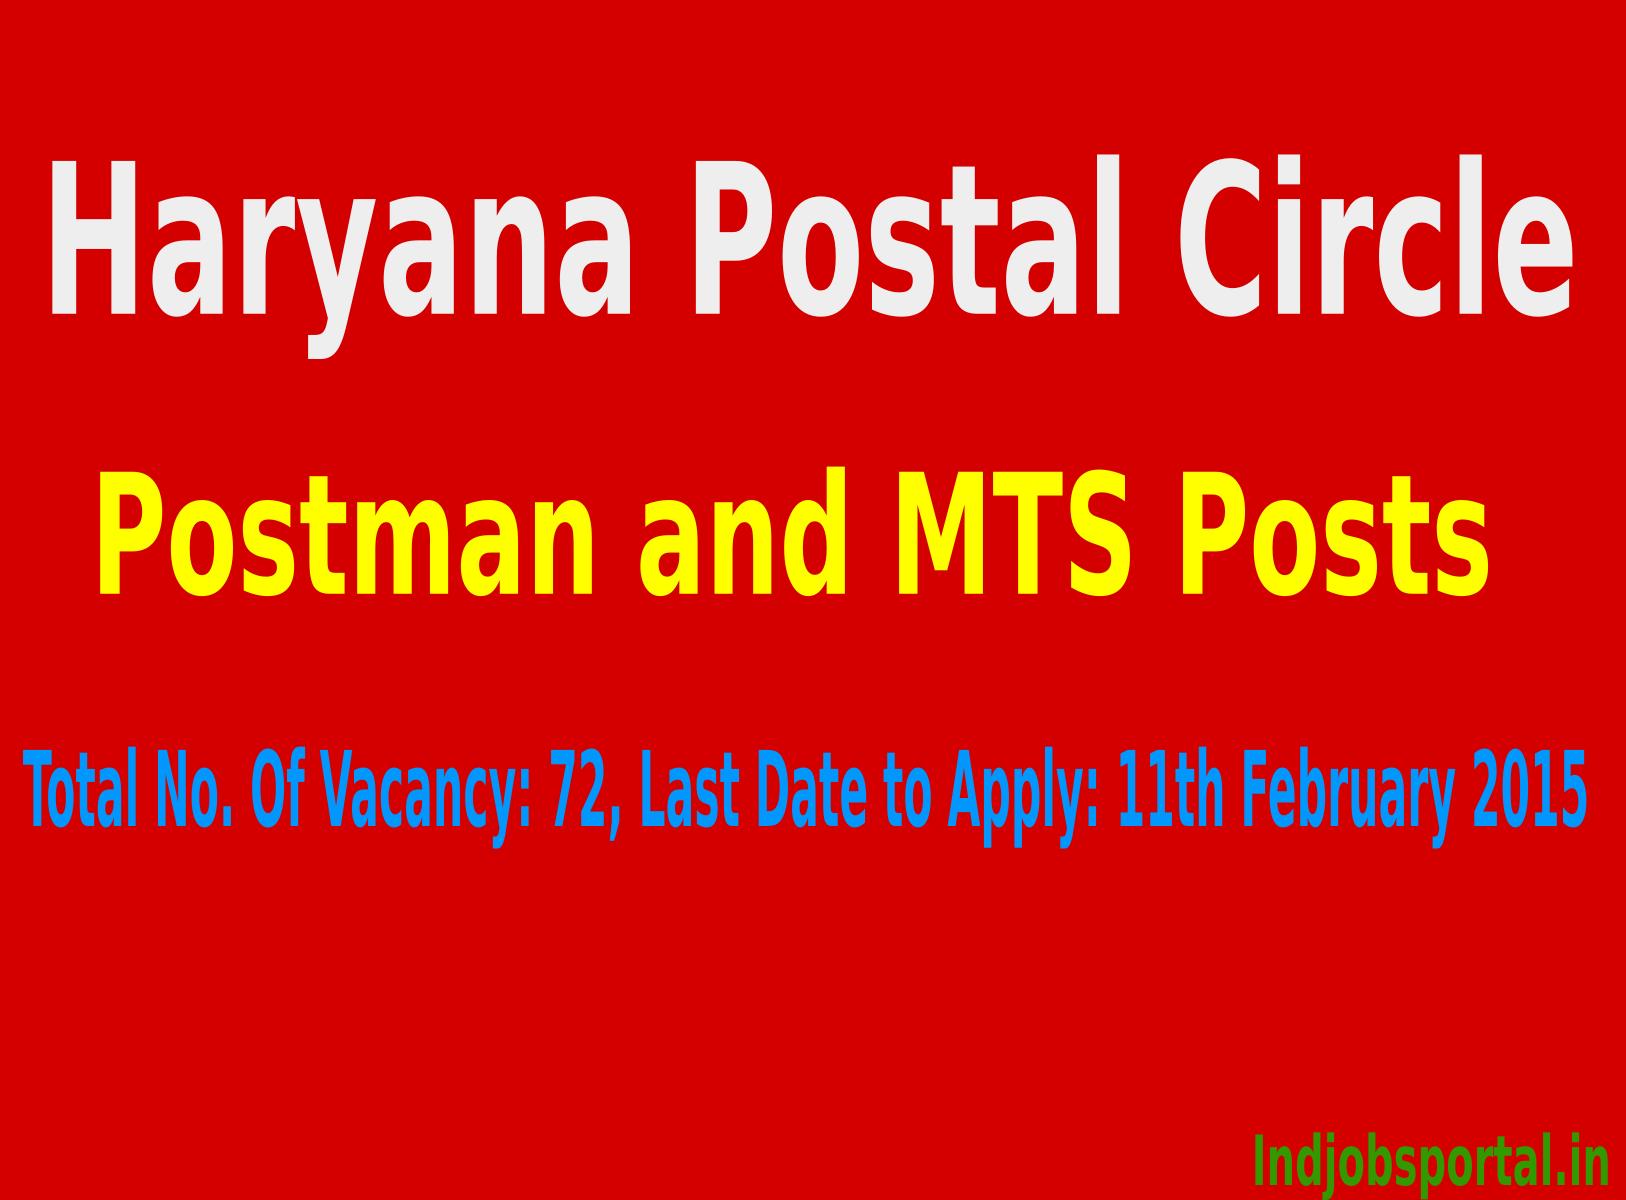 Haryana Postal Circle Recruitment 2015 for Postman and MTS PostsHaryana Postal Circle Recruitment 2015 for Postman and MTS Posts